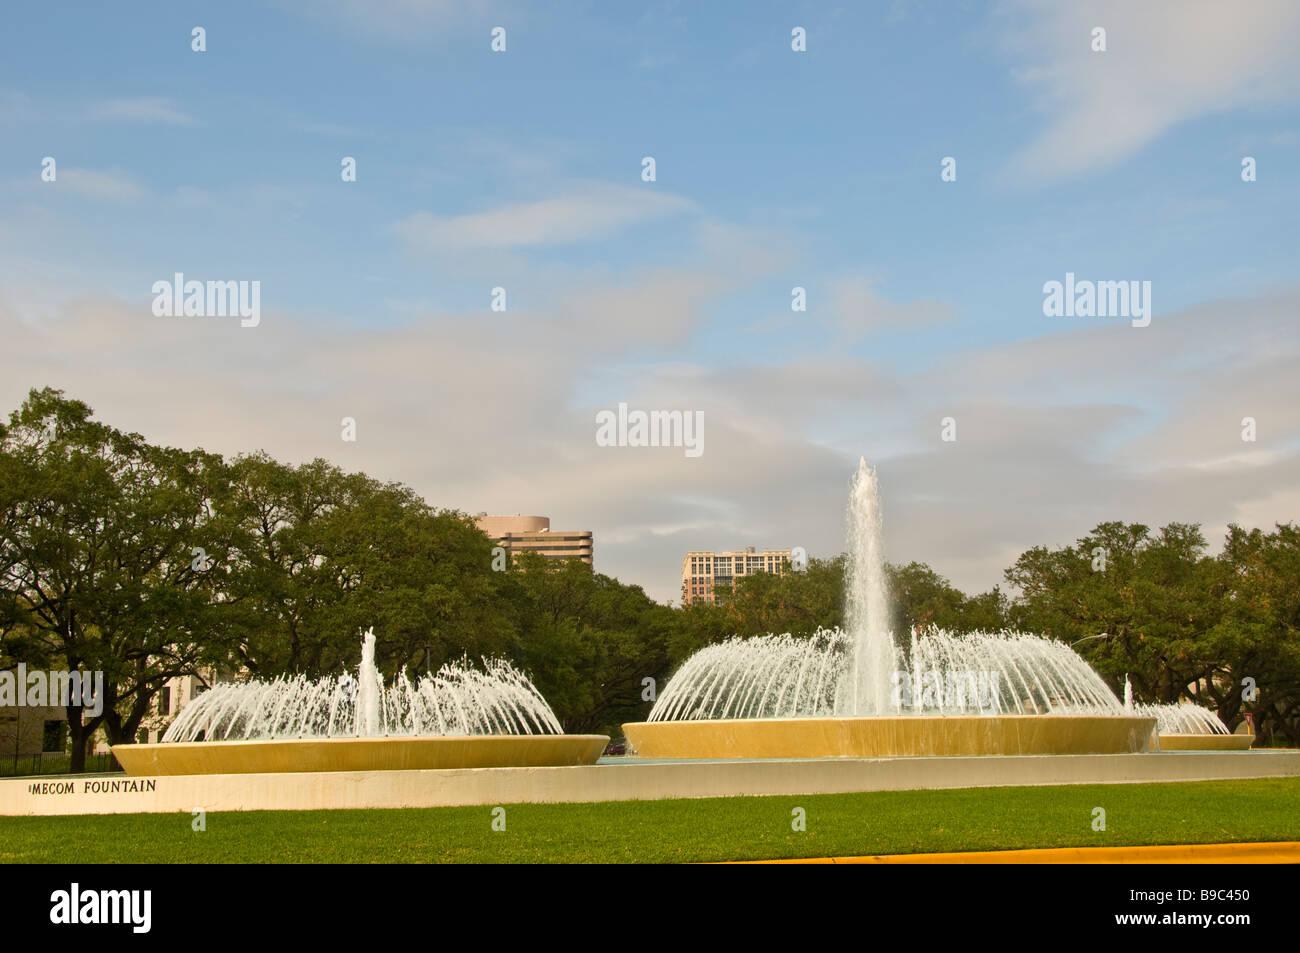 Mecom Fountain museum district Houston Texas tx city landmark fountain shooting water  Main Street at Montrose Boulevard - Stock Image